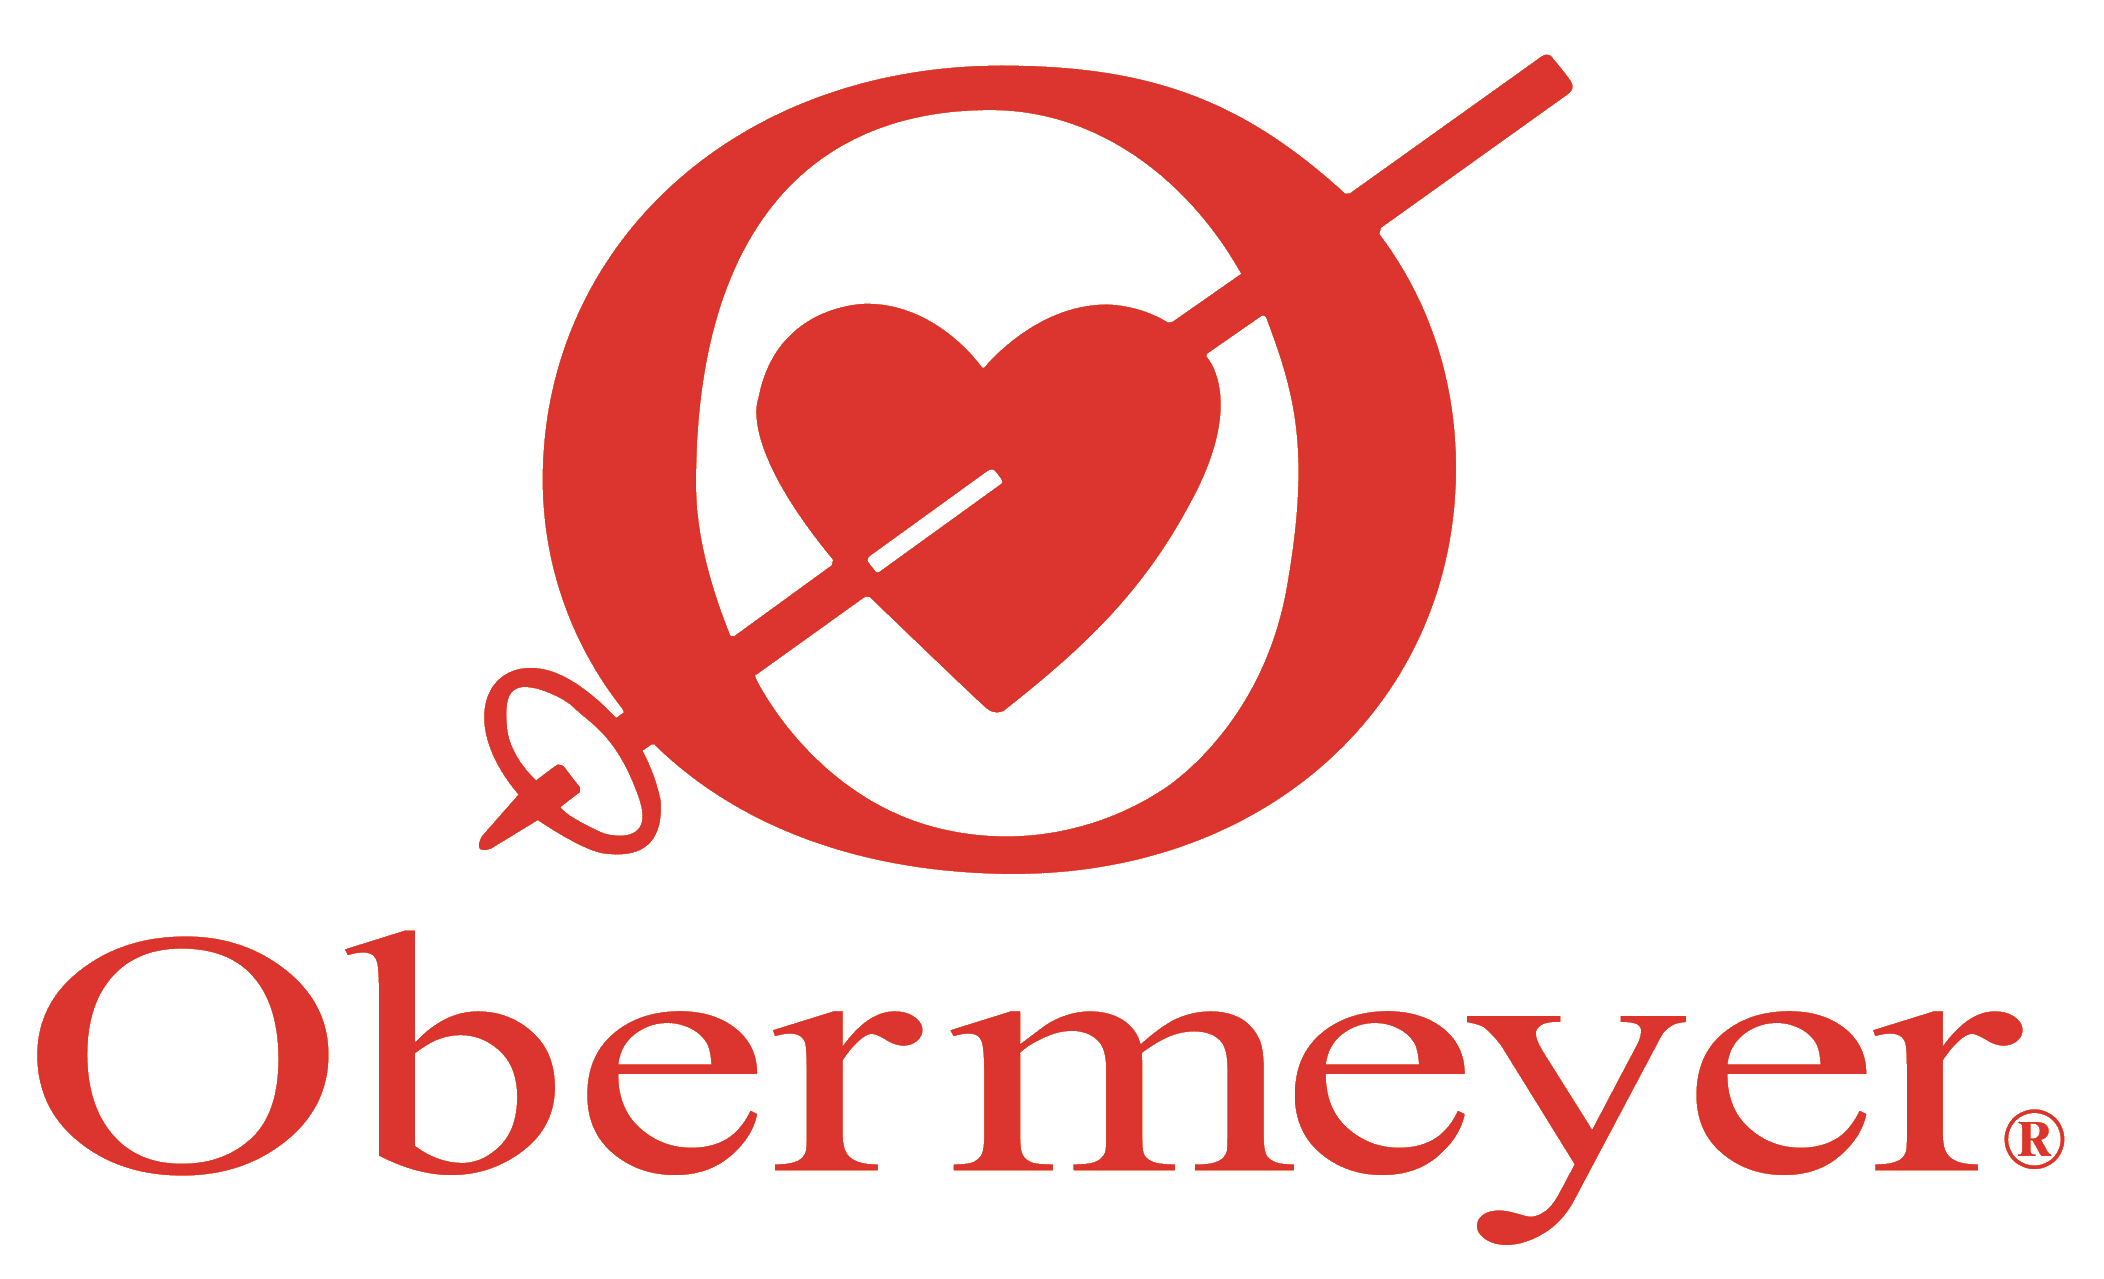 obermeyer-ski-logo-2104x1279trans.png